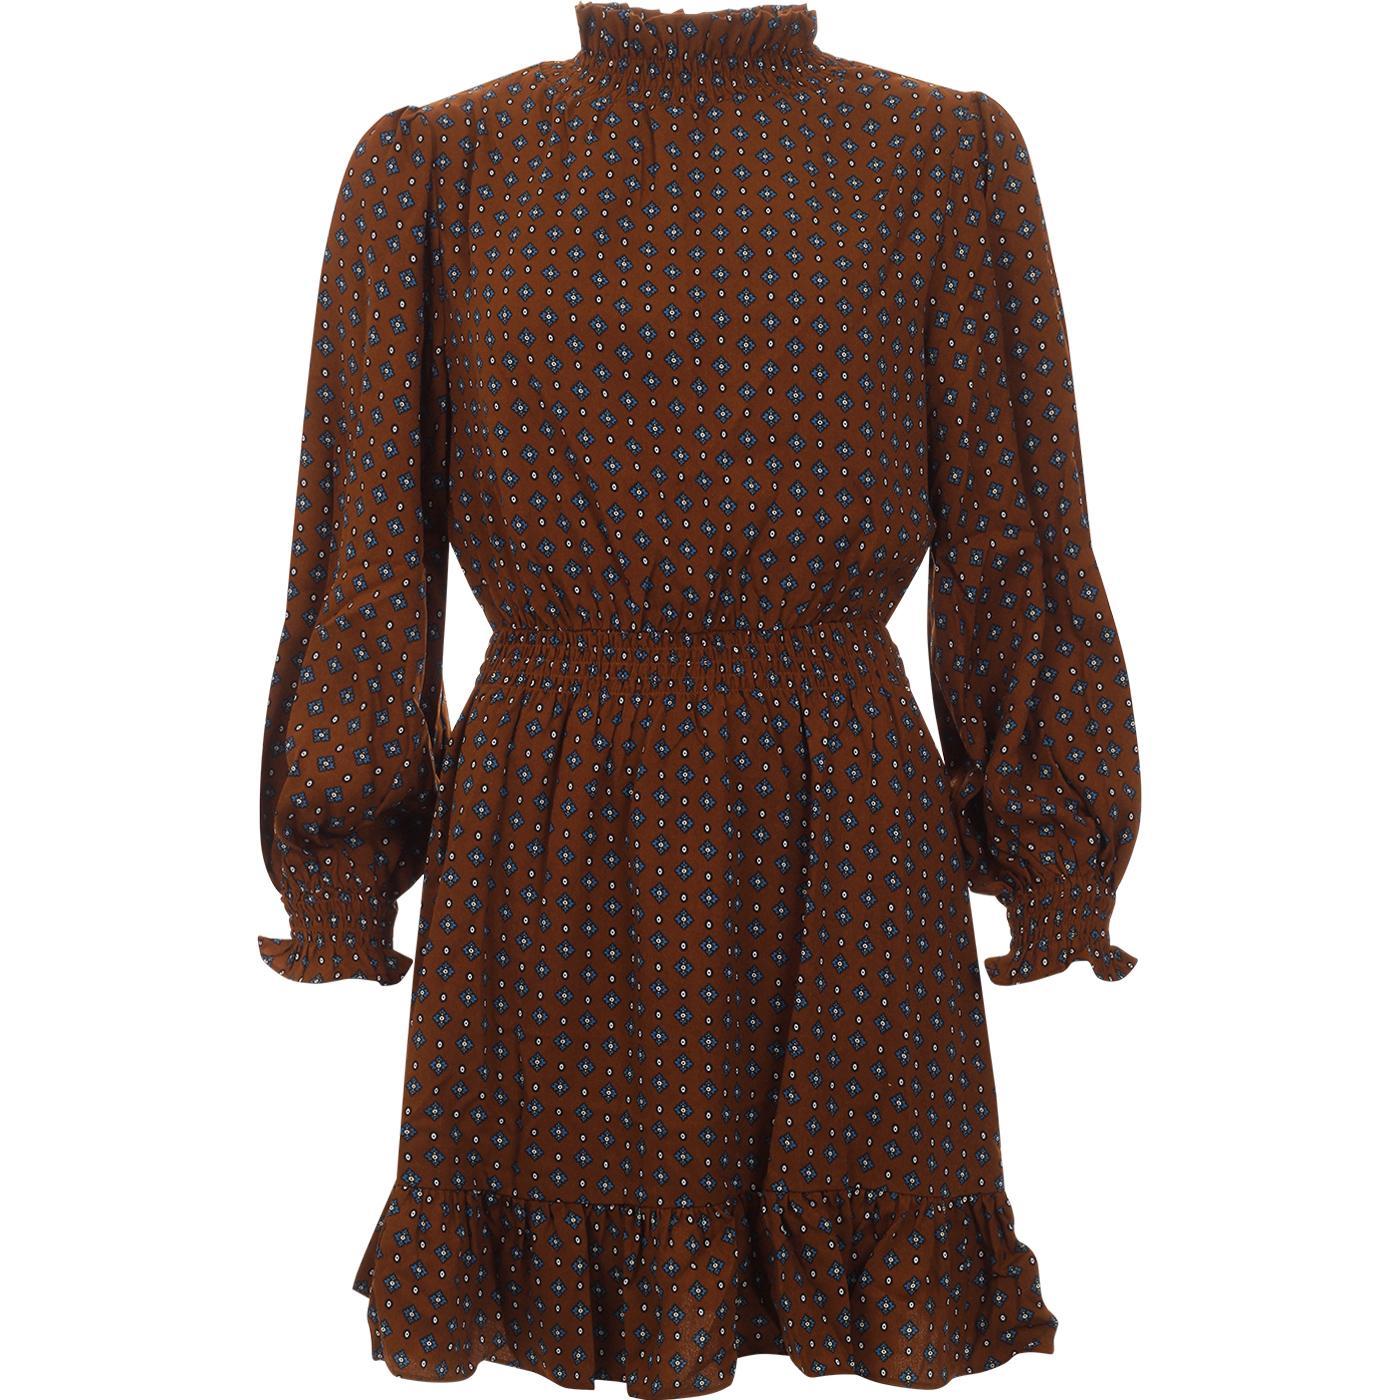 Alana LOUCHE Shirring Collar Vintage Stamp Dress